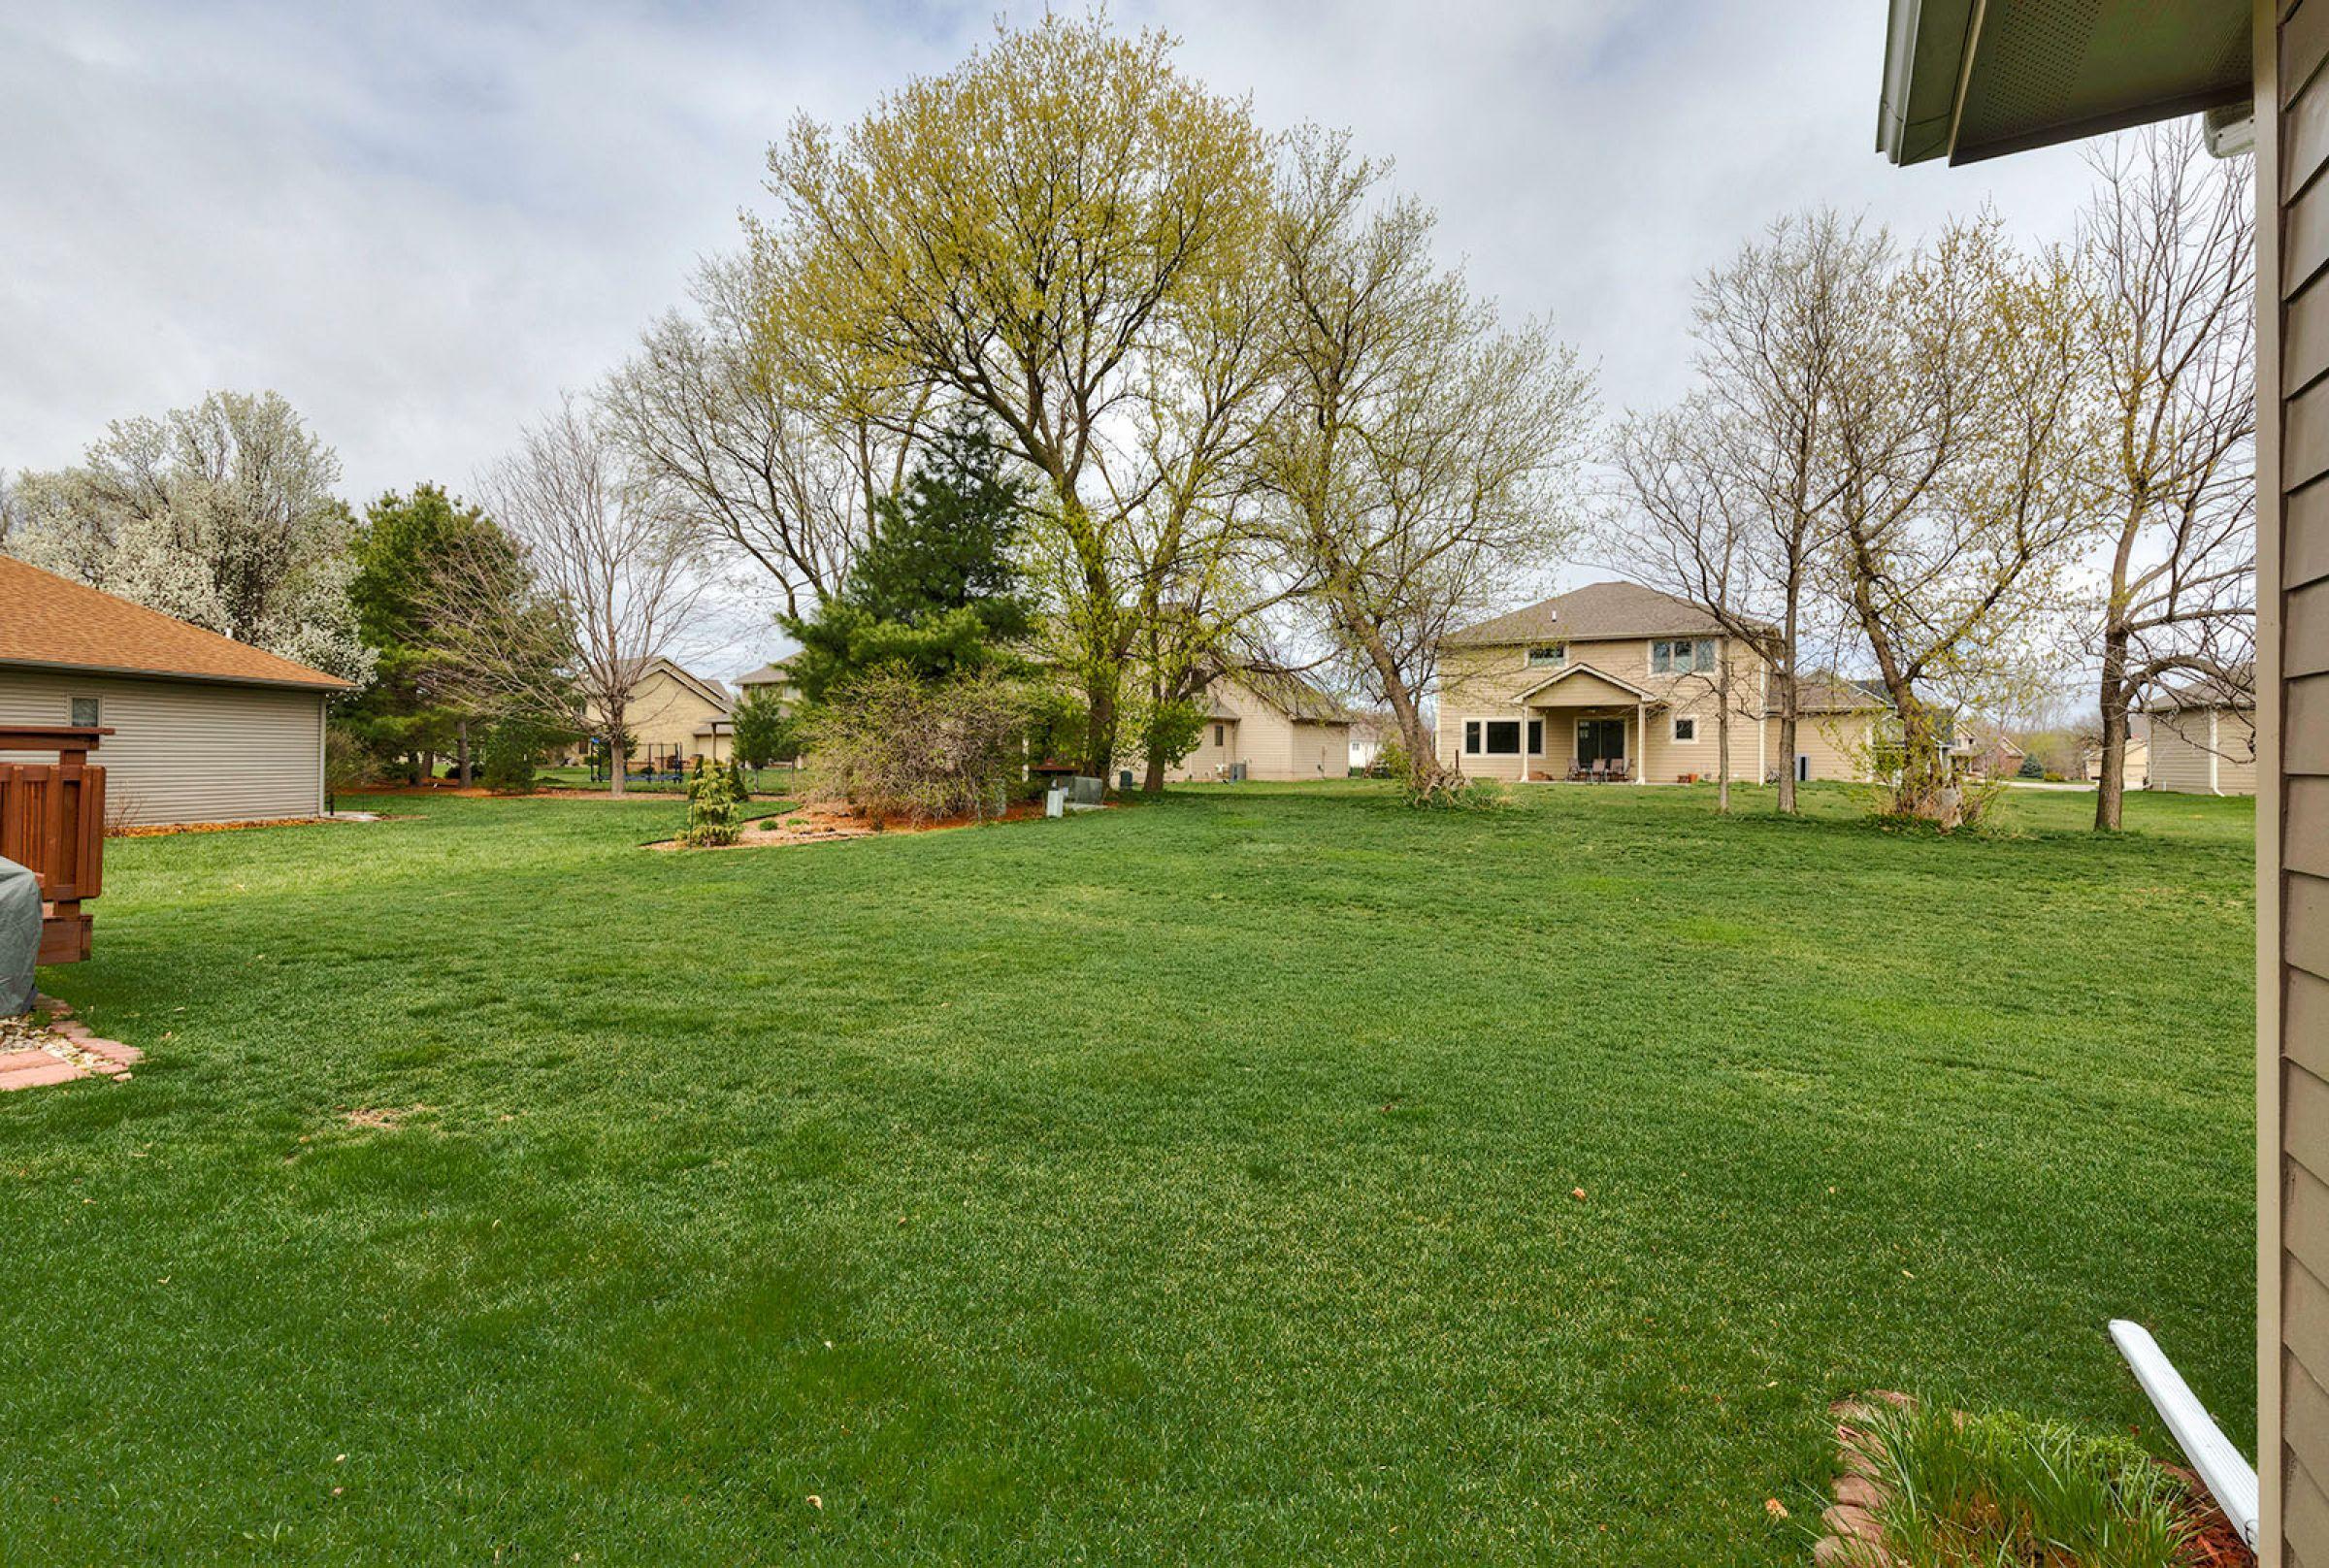 polk-county-iowa-0-acres-listing-number-15458-3-2021-04-11-140724.jpg